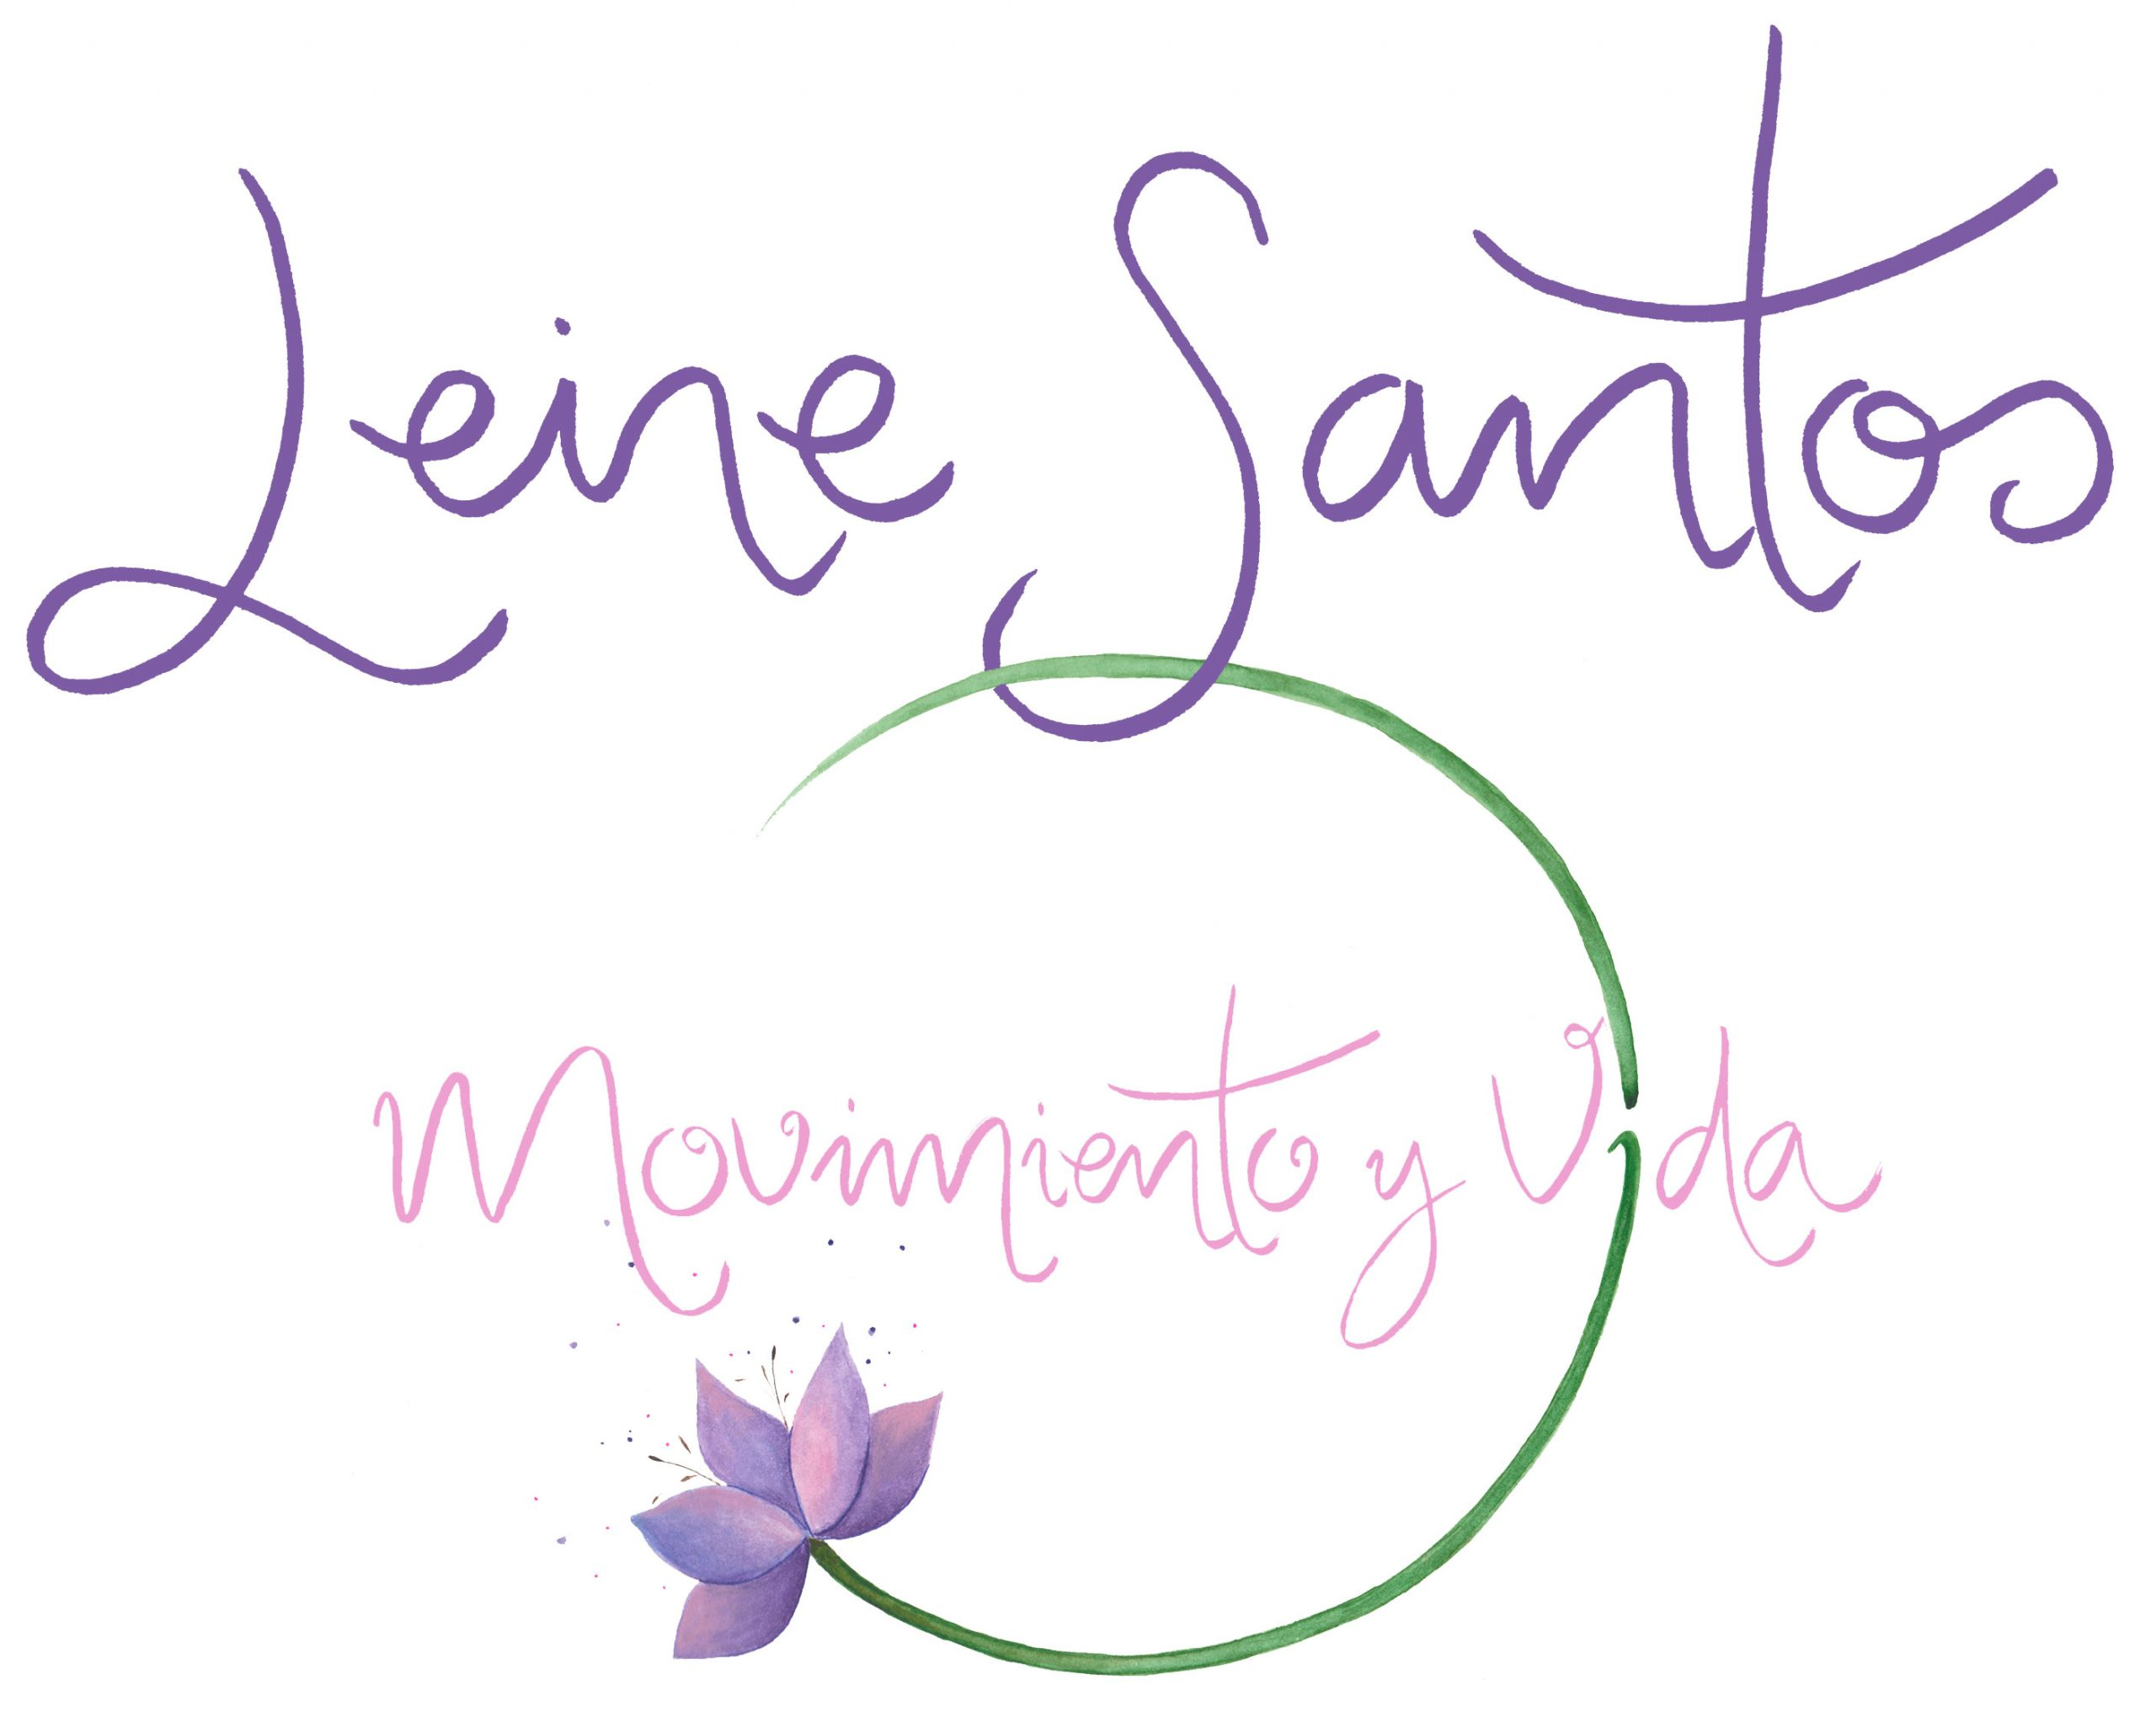 Leire Santos